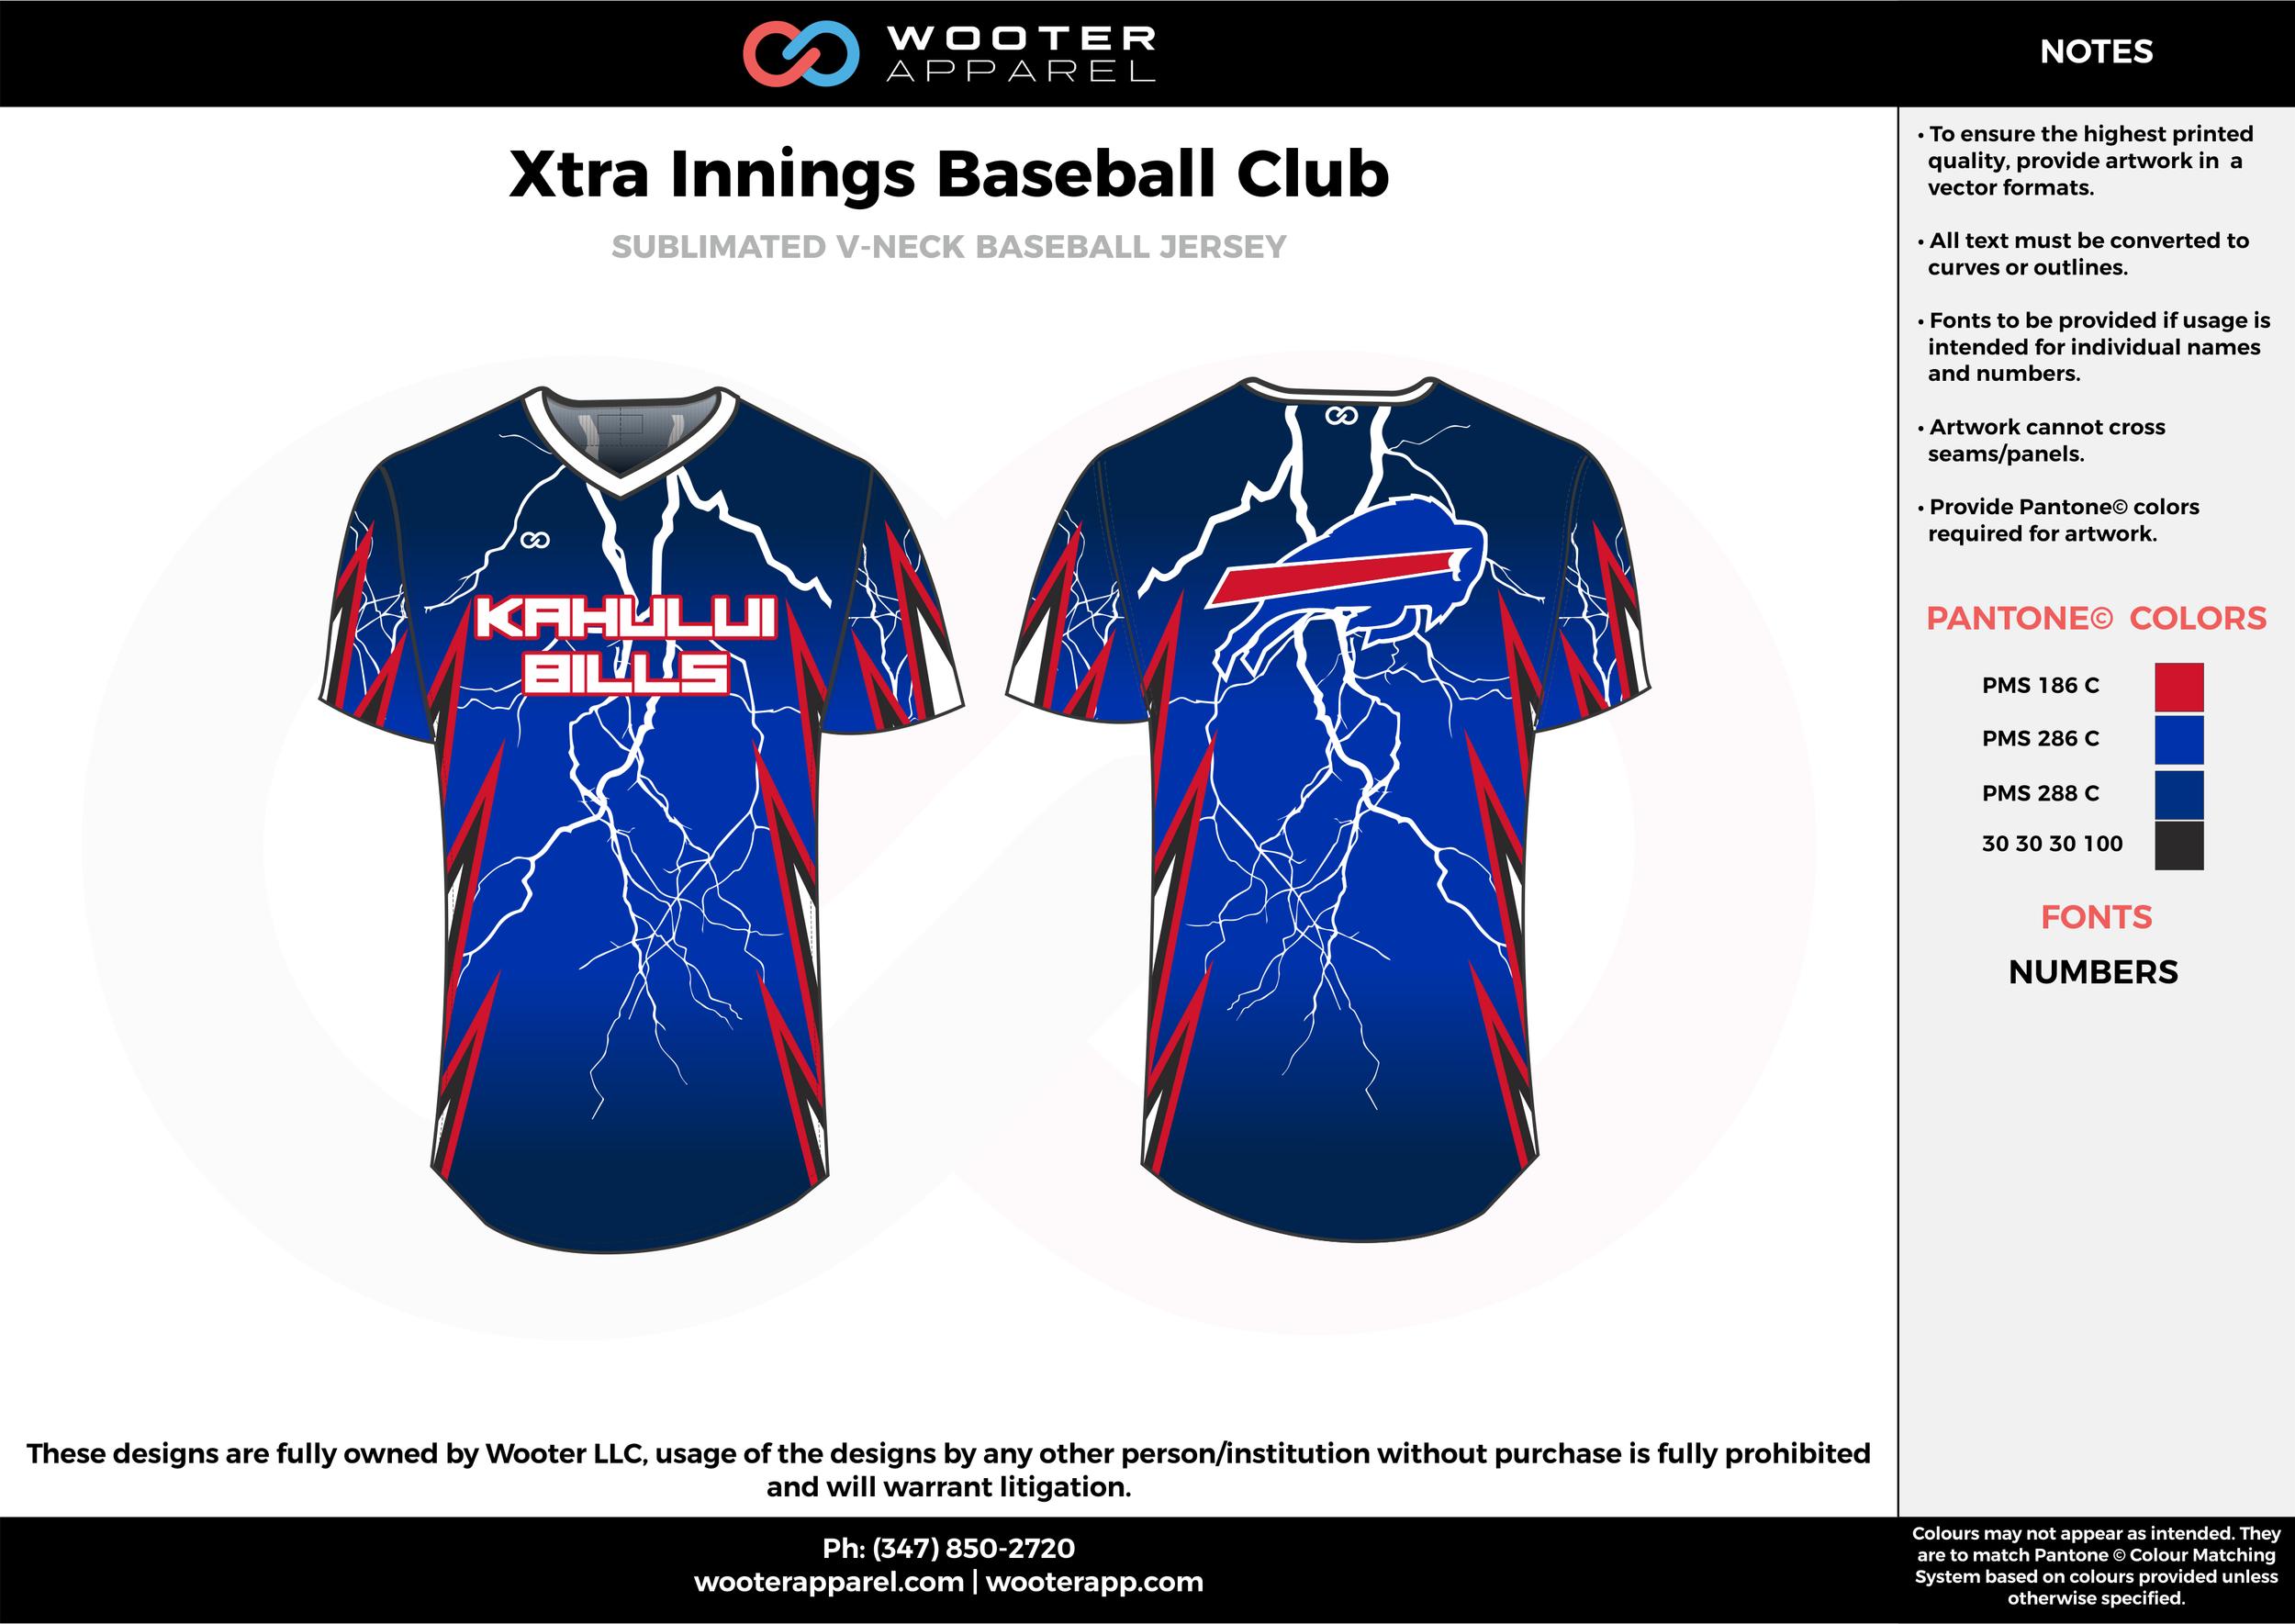 XTRA INNINGS Baseball Club blue black red white flag football uniforms jerseys top